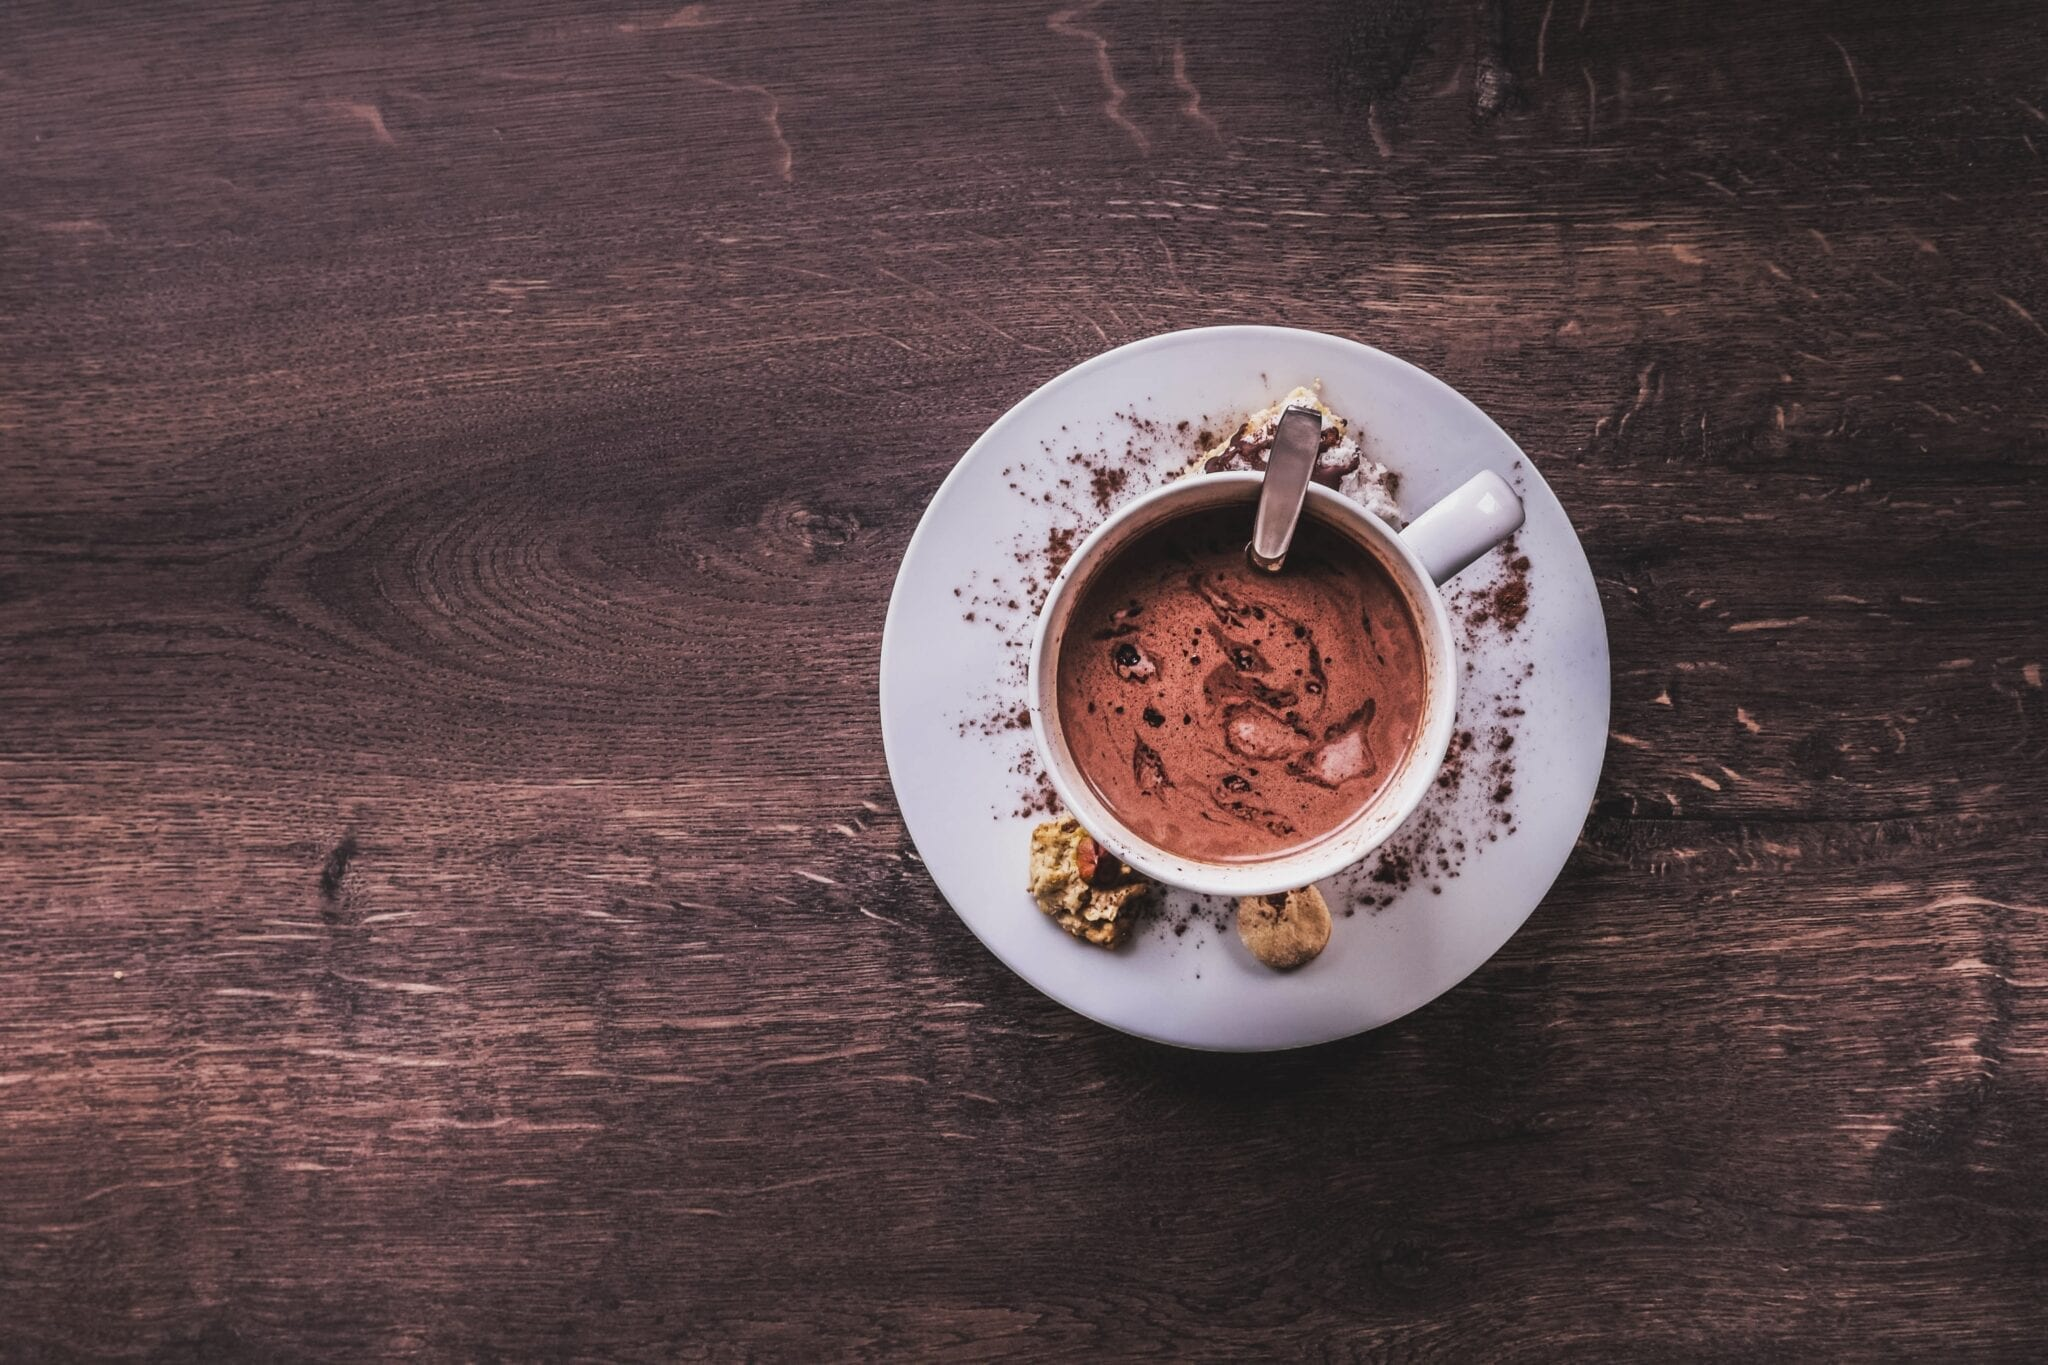 Hot chocolate. Photo by Jonny Caspari, Unsplash